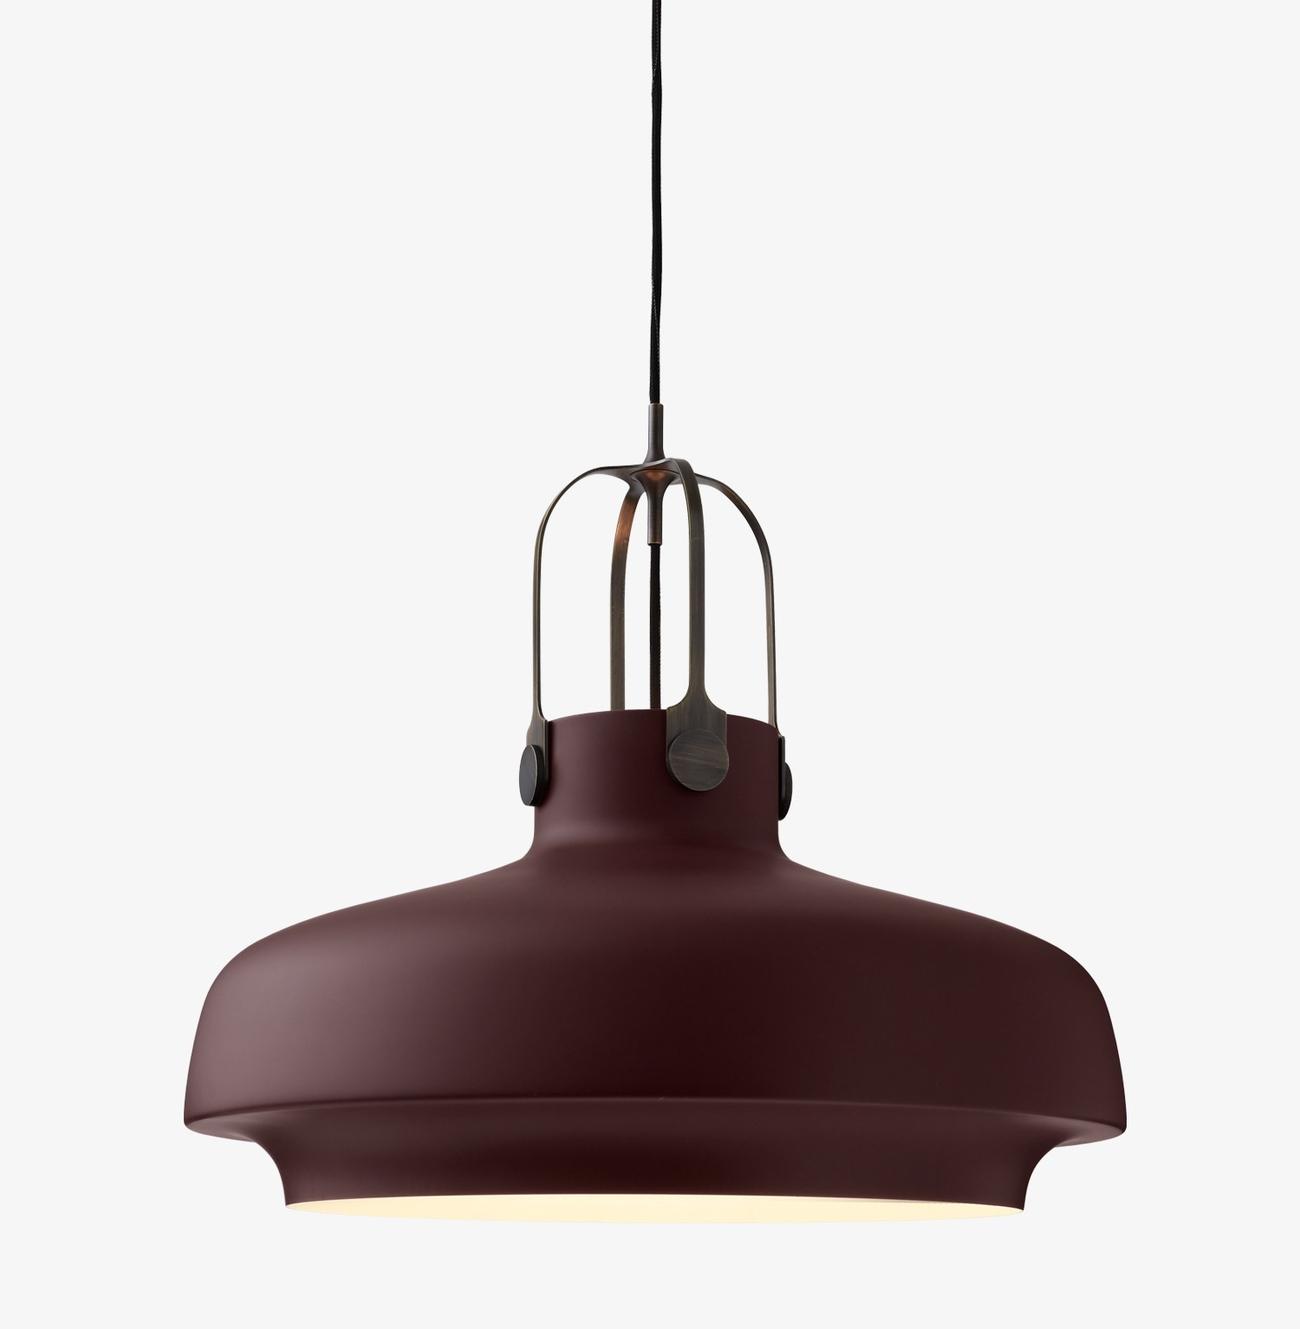 tradition Copenhagen hanglamp SC8 Plum